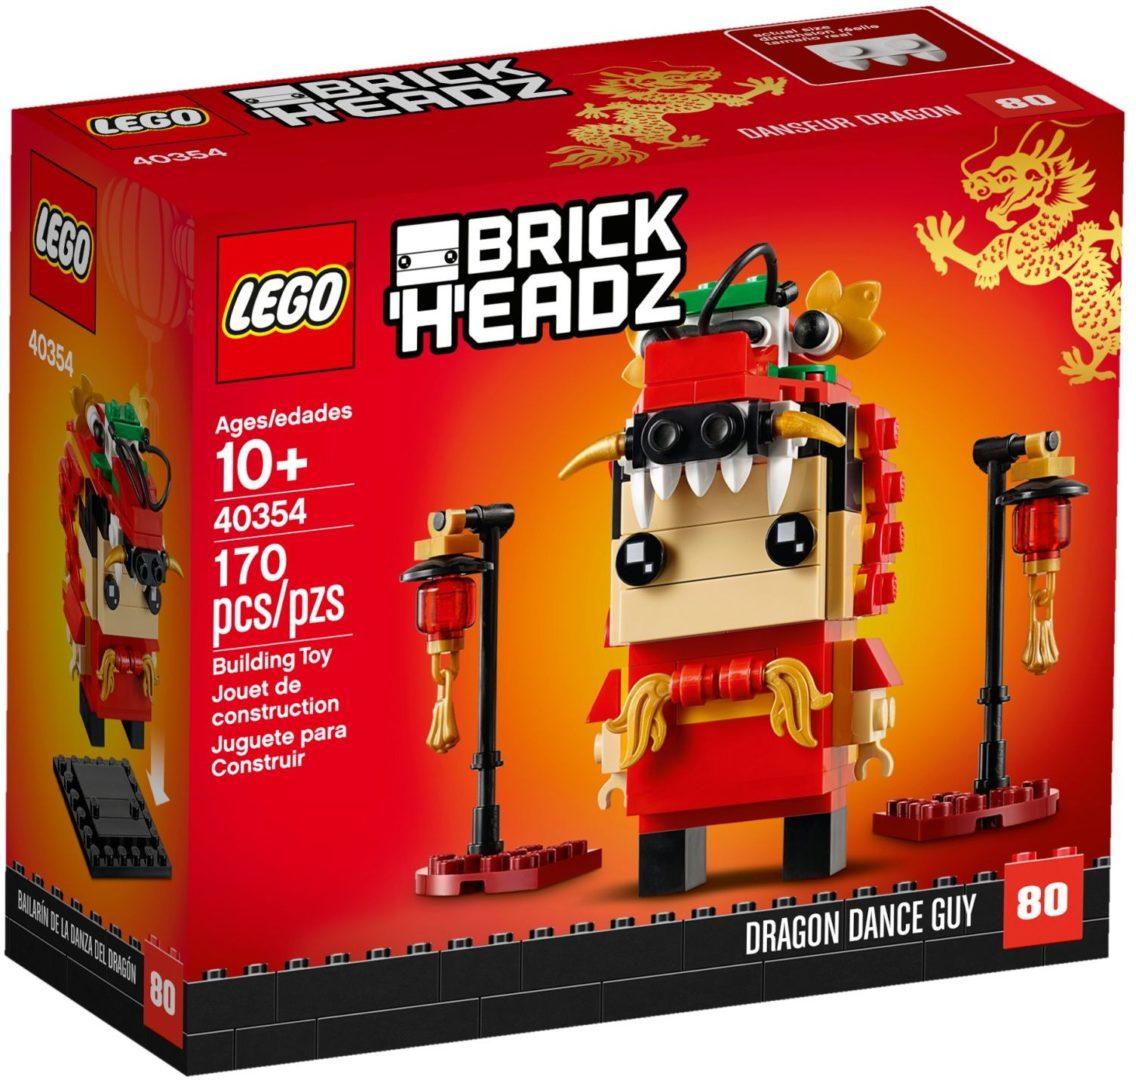 Lego BrickHeadz 40354 Dragon Dance Guy